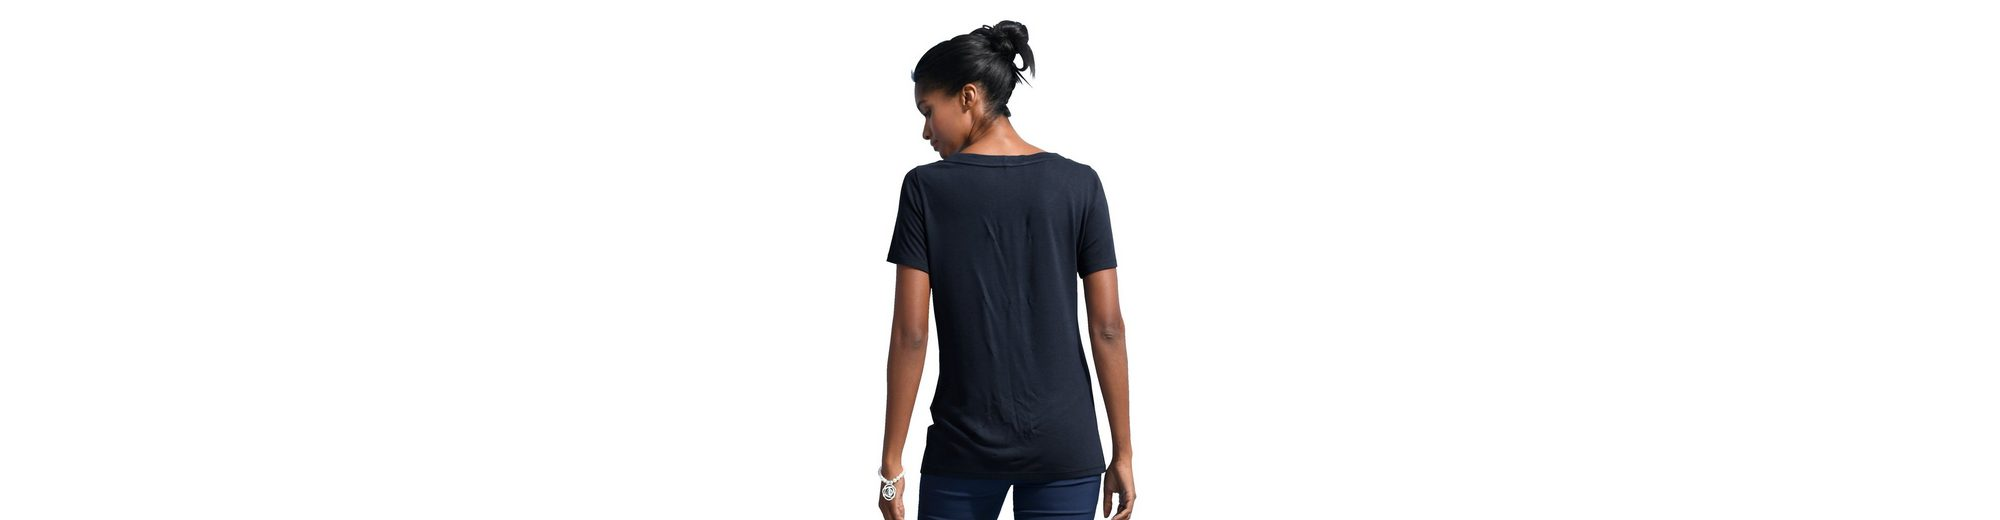 Alba Moda Shirt mit gemustertem Schleifendetail gemustertem mit Shirt Shirt Alba Alba Schleifendetail Moda Moda 6Fw6qrxv